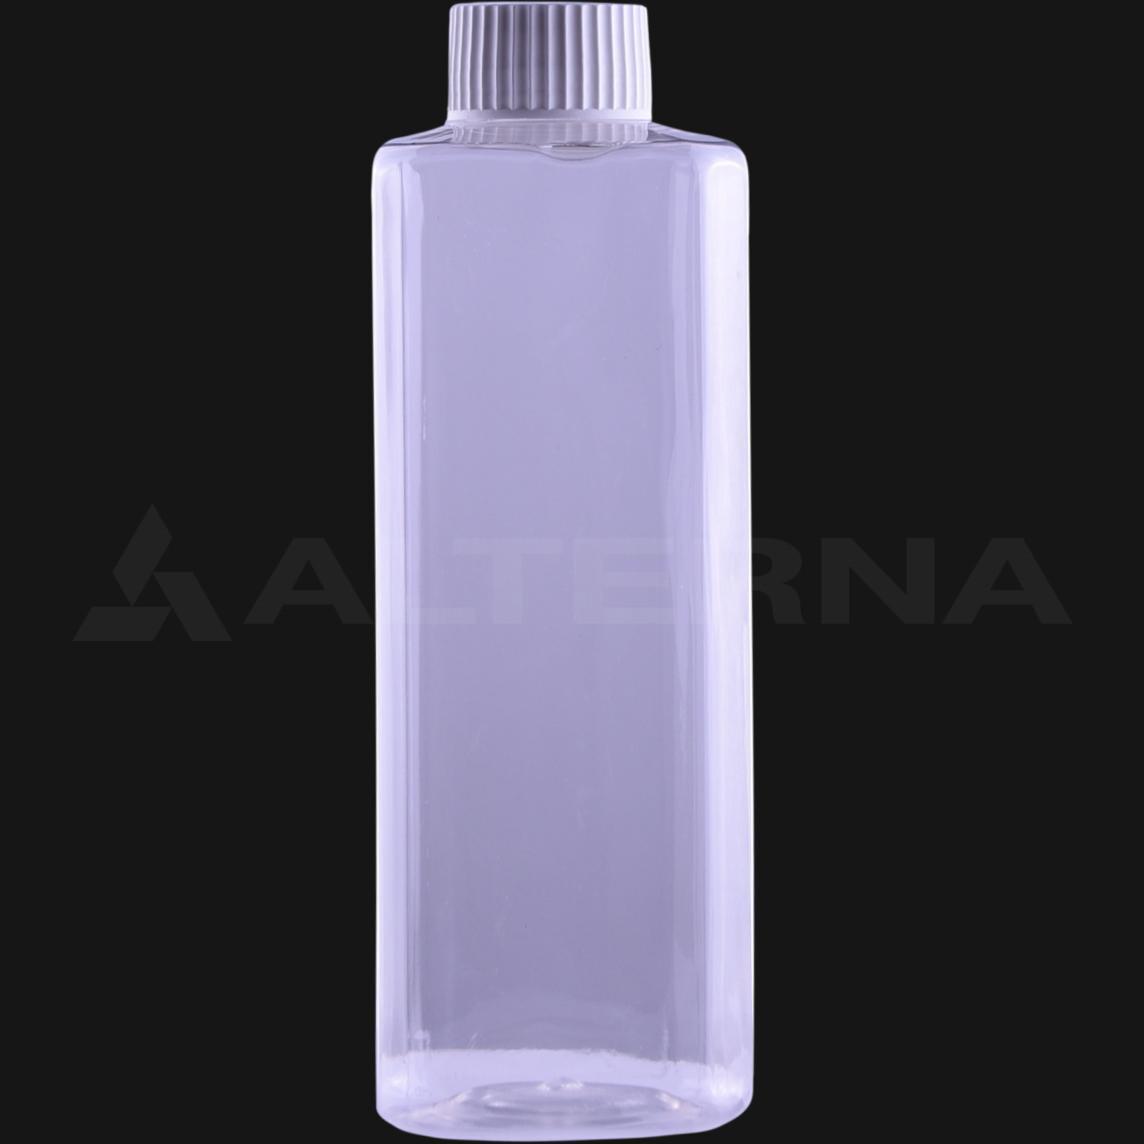 400 ml PET Square Bottle with 28 mm Foam Seal Cap